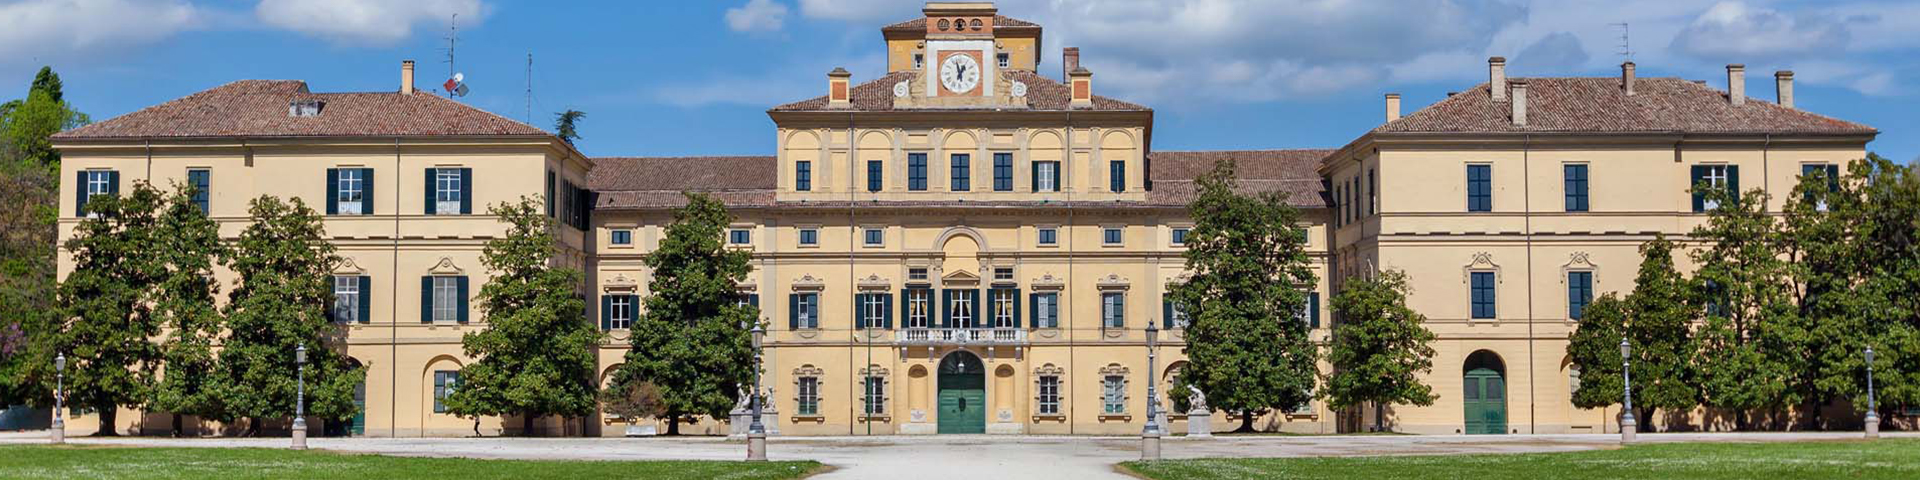 Fondazione Geometri di Parma